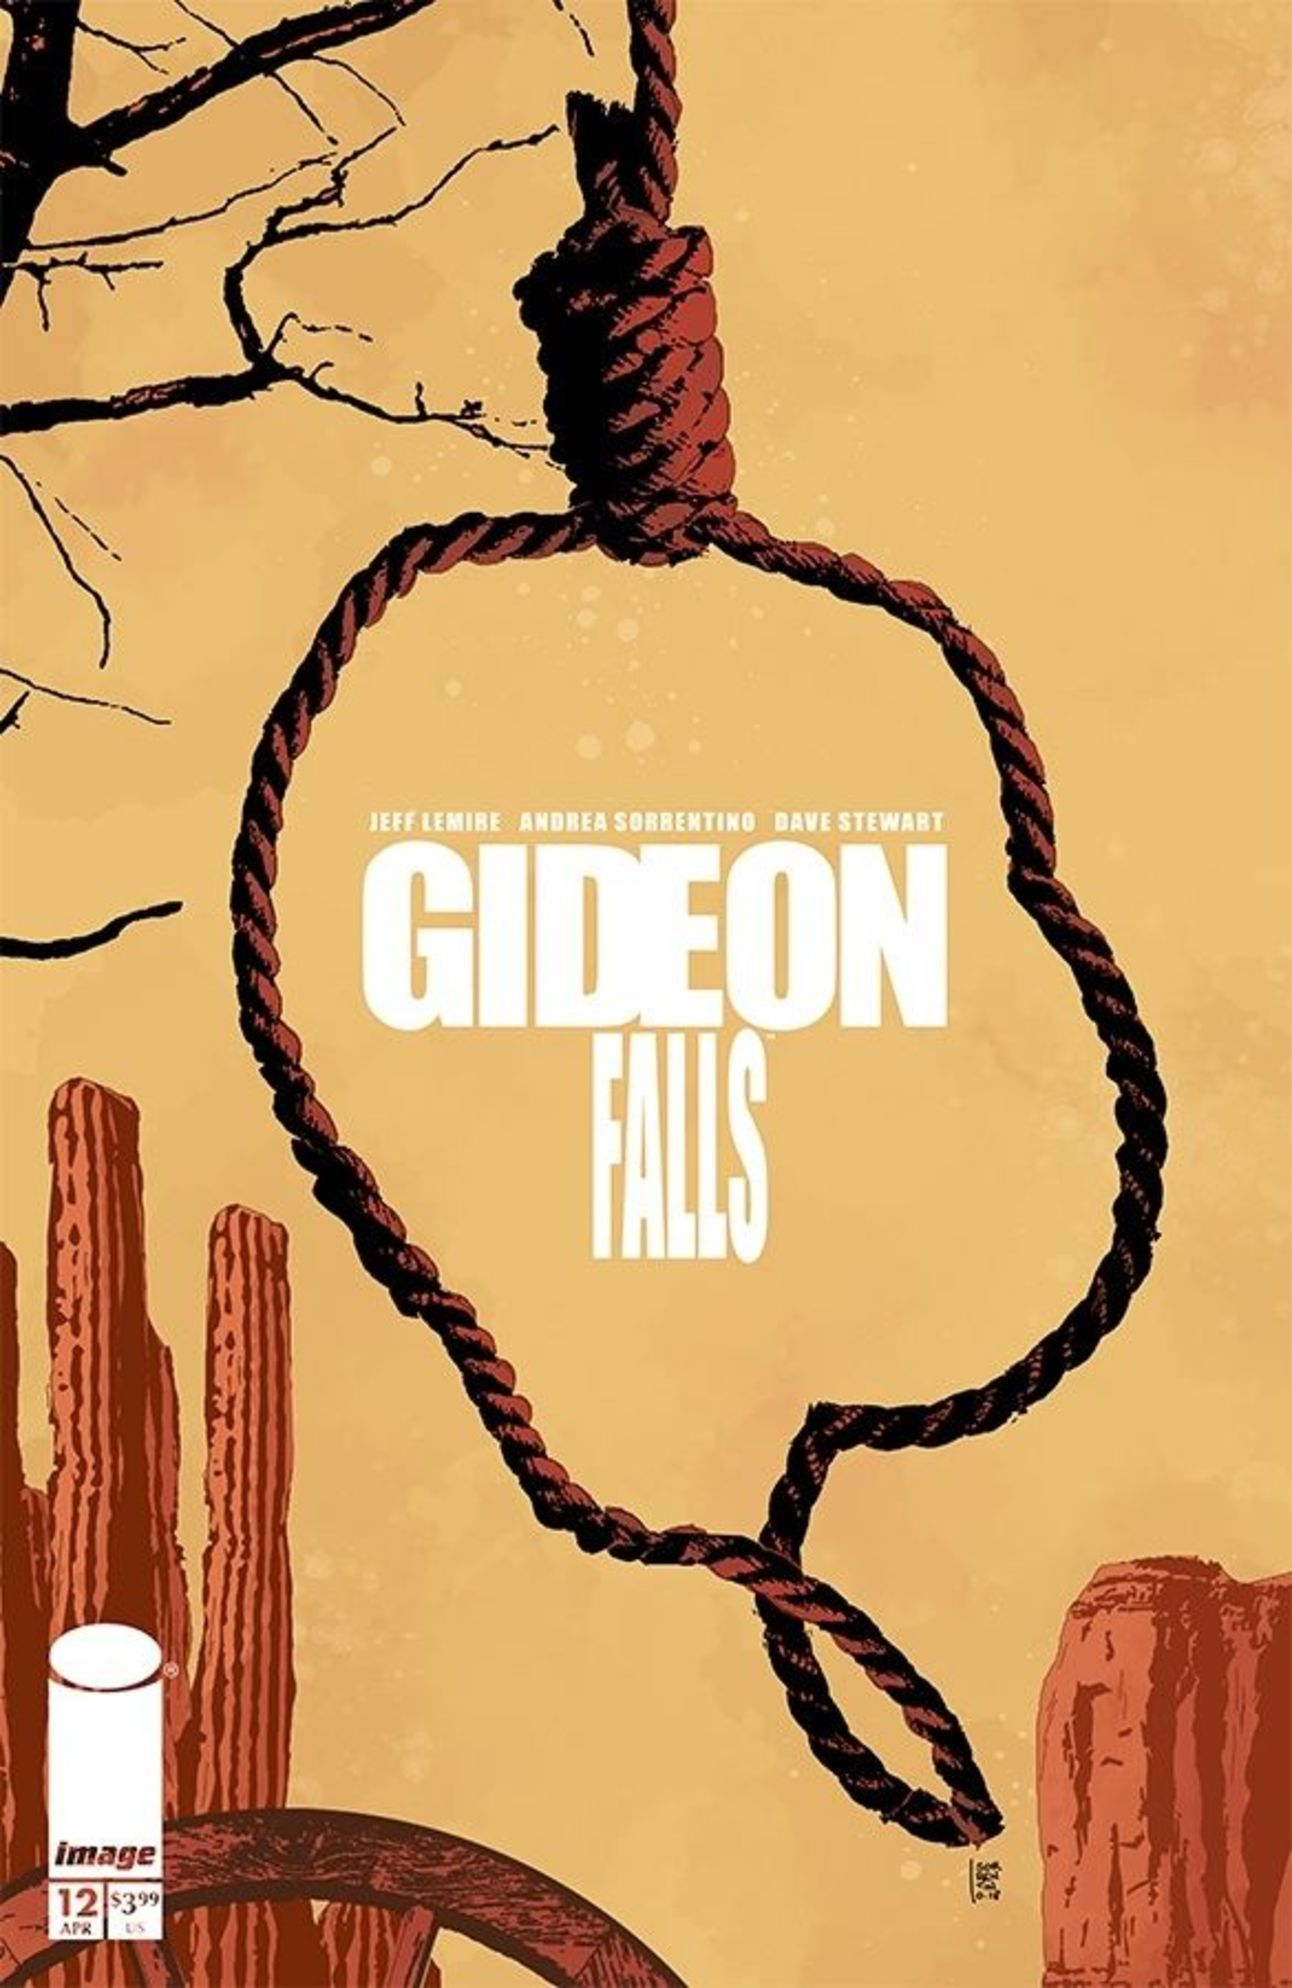 Gideon Falls #12, Image Comics